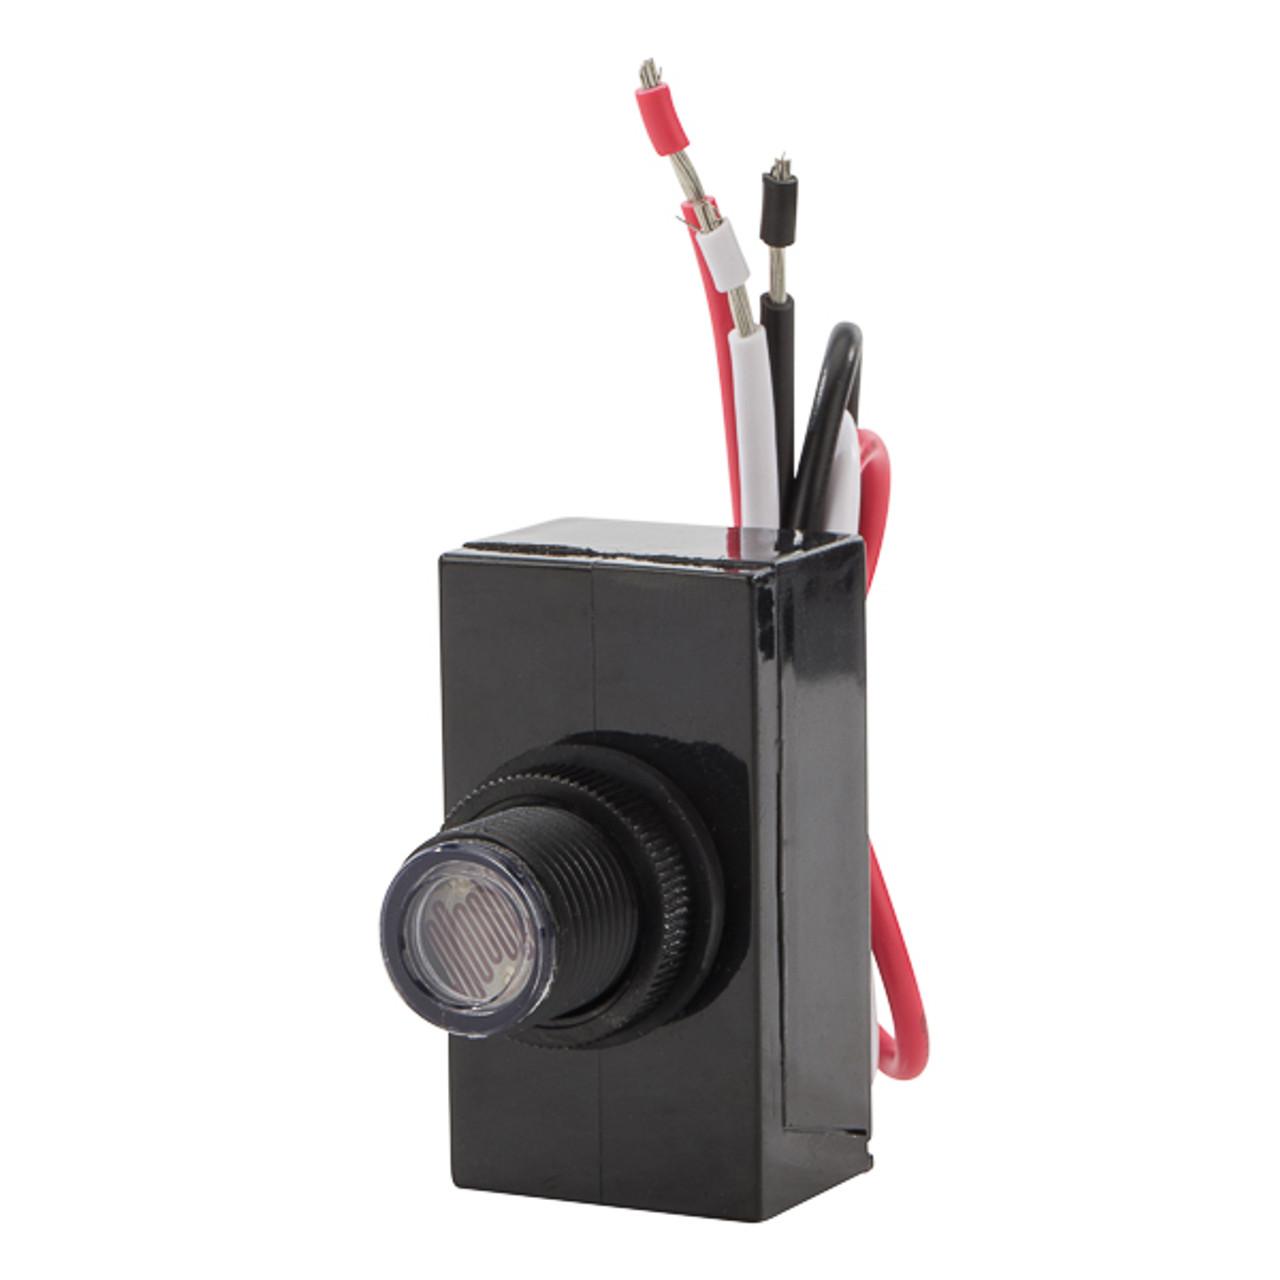 Tork 3002 208-277v 1500w Flush Mounted Photo Control Timing Swit